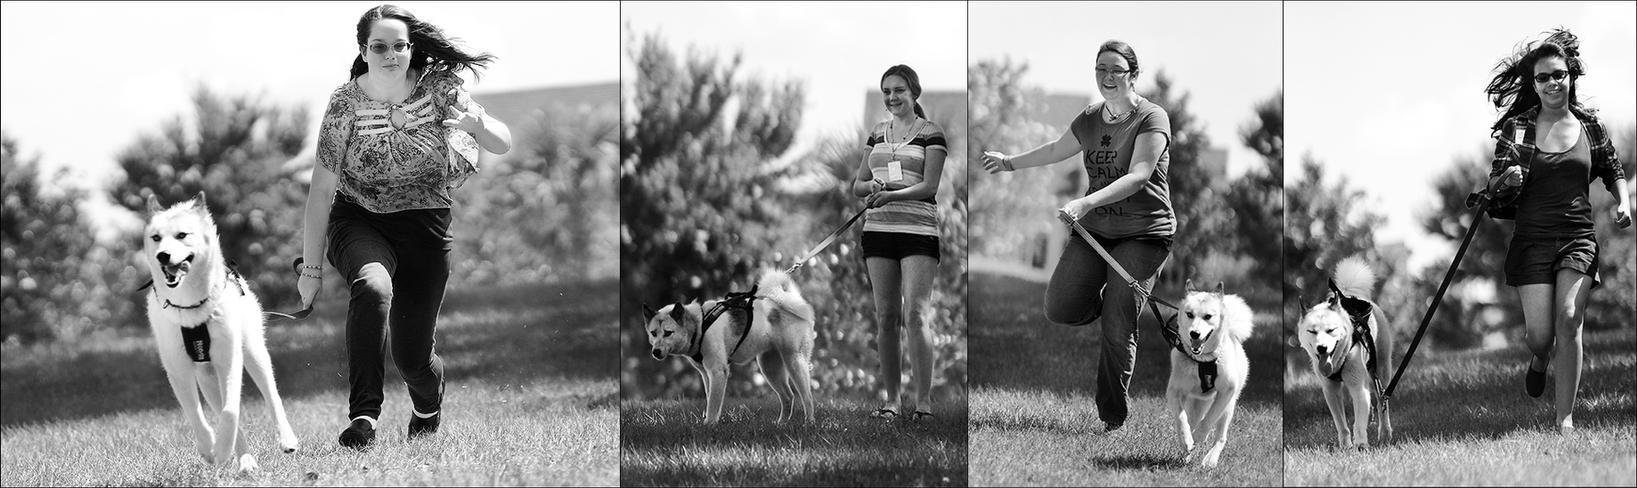 Running with Arnaq 2 by Exileden